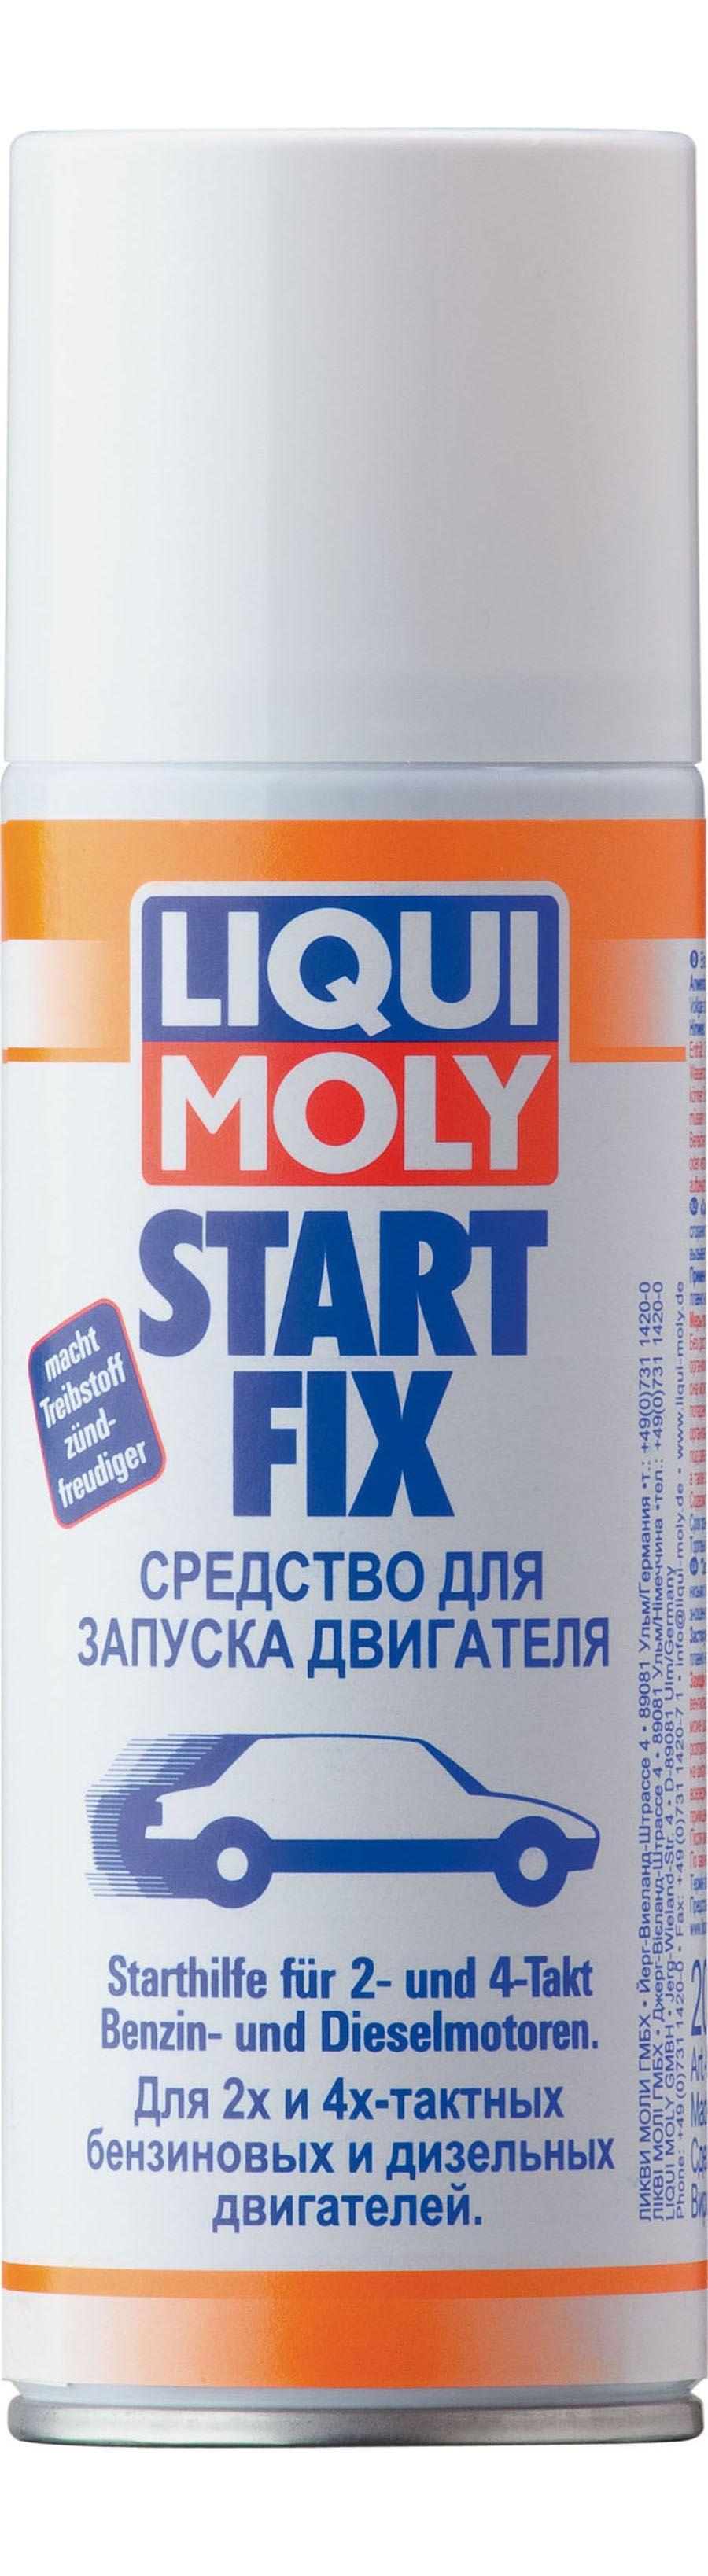 Быстрый старт LiquiMoly Start Fix аэрозоль 200 мл 3902